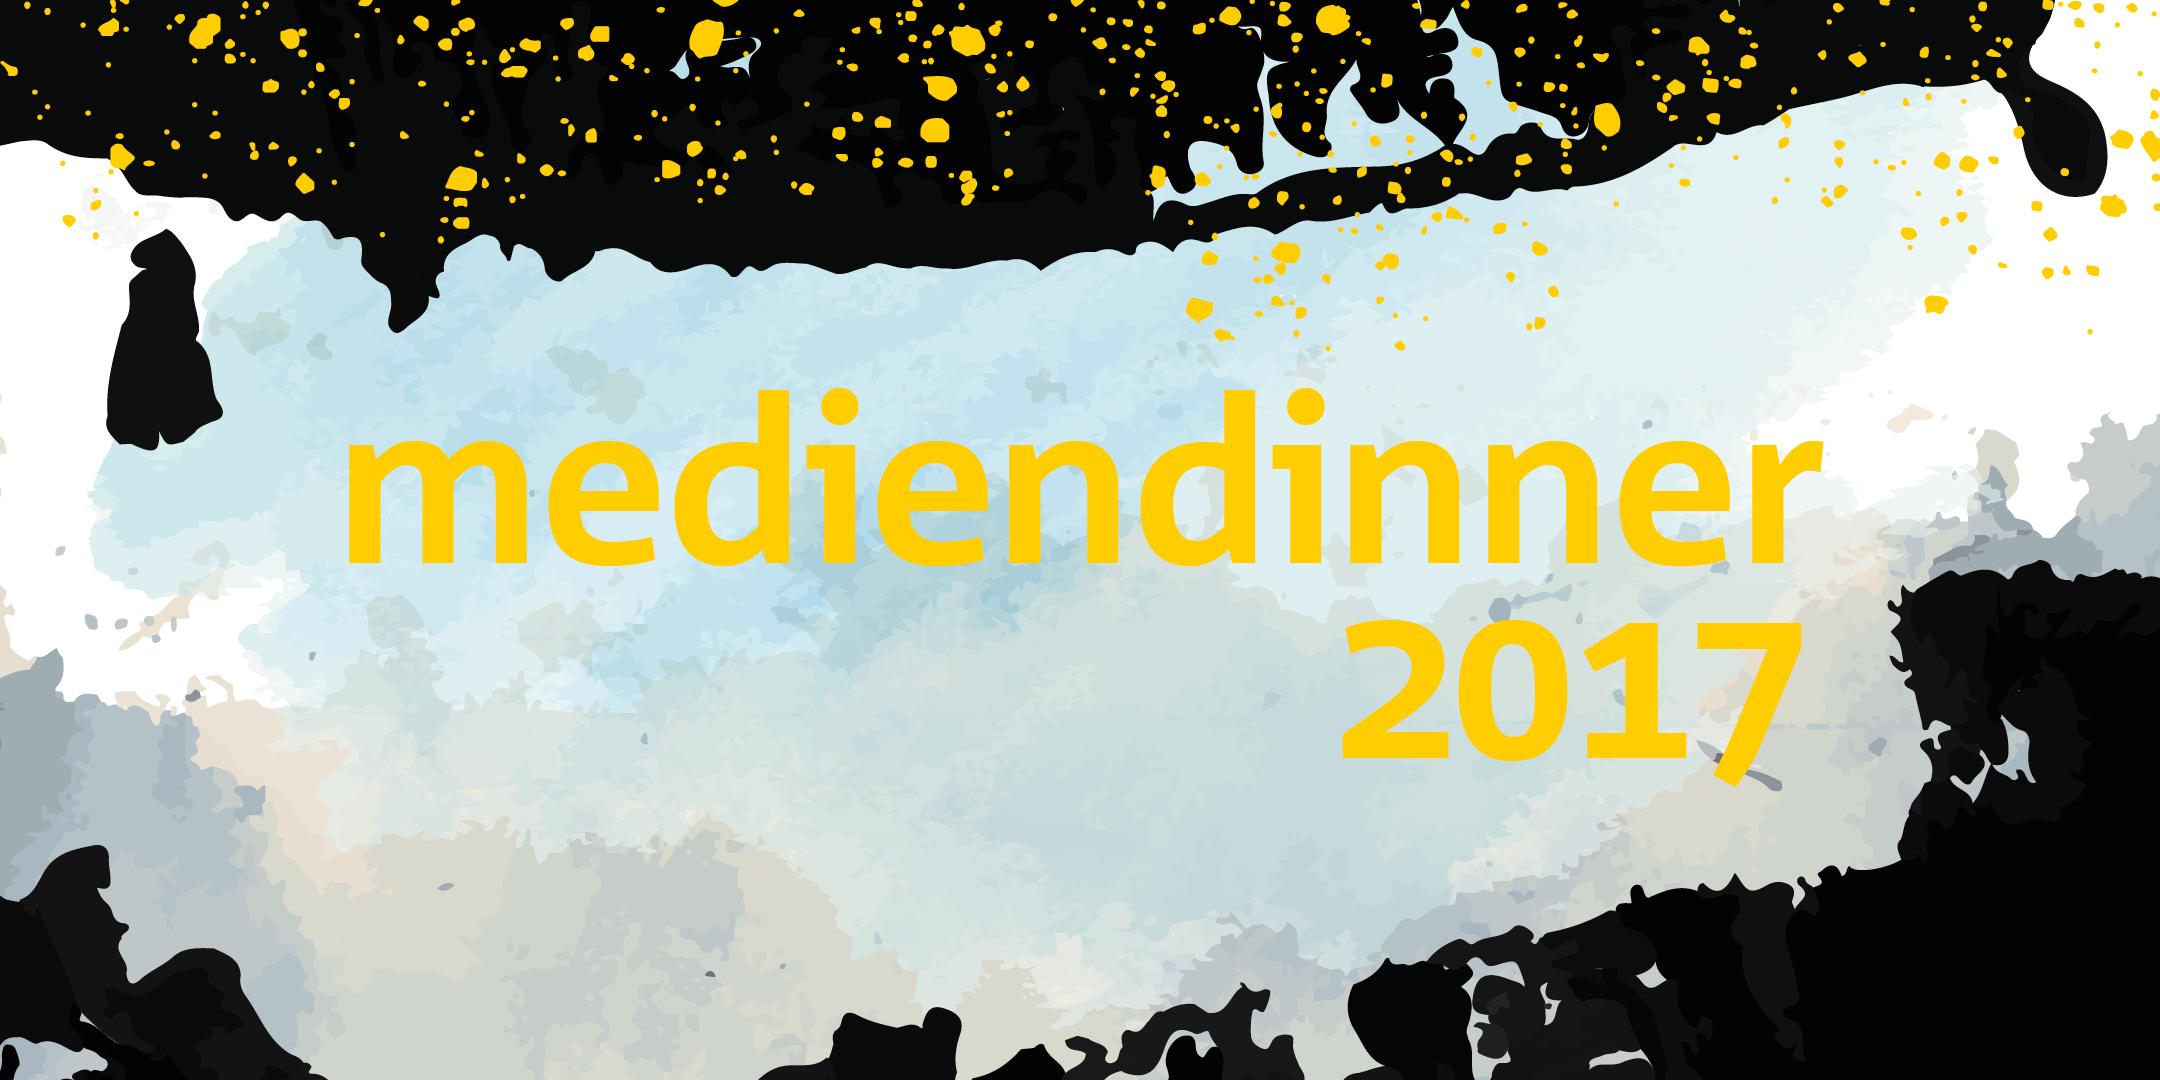 171016_medianet_Mediendinner-2017_Eventbride-Header_2160x1080px